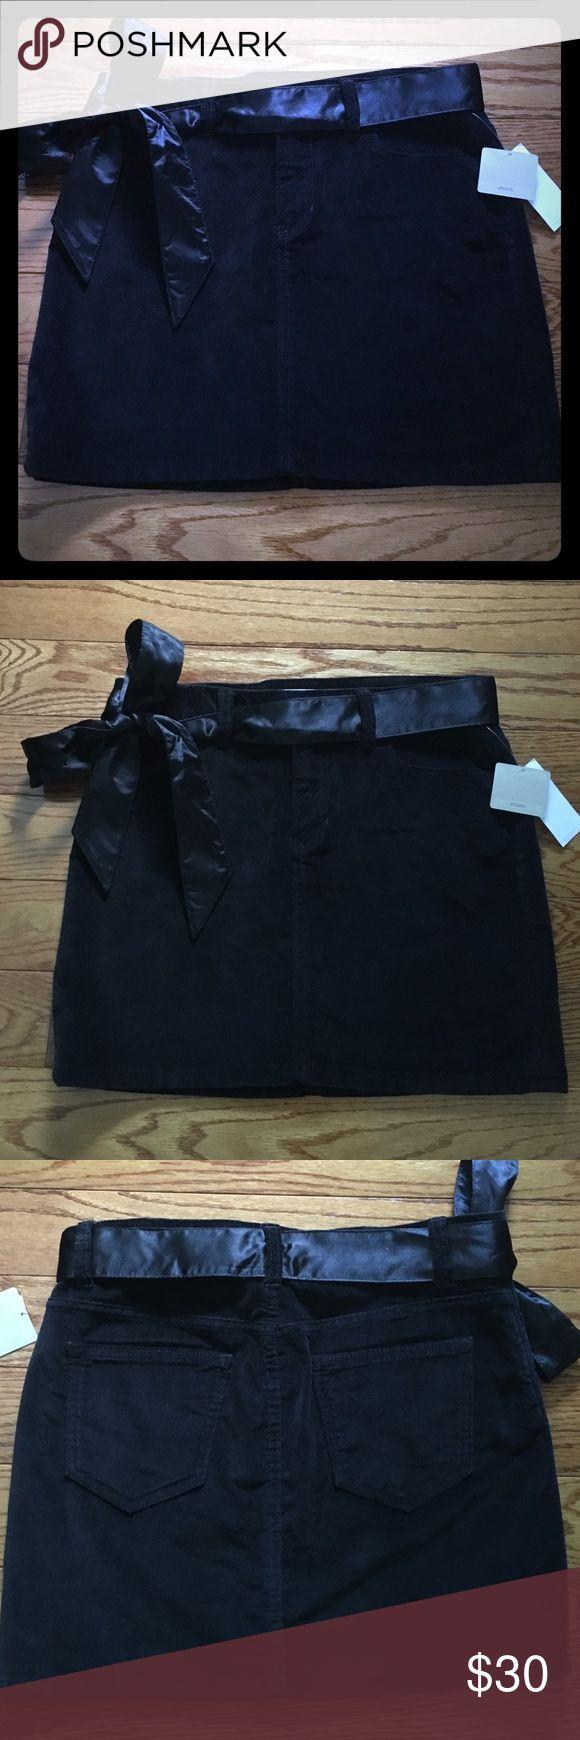 "Black velvet stretch mini skirt w/ removable belt Super cute & sexy black velvet mini skirt with removeable silky belt. NWT! 98%cotton 2%lycra spandex. Size 4. Waist measures 32-33"" closed. Zip, hook, button closure. Front slant pockets. 2 back pockets. Just too short for my comfort level. I'm 5'5. Gap Skirts Mini"